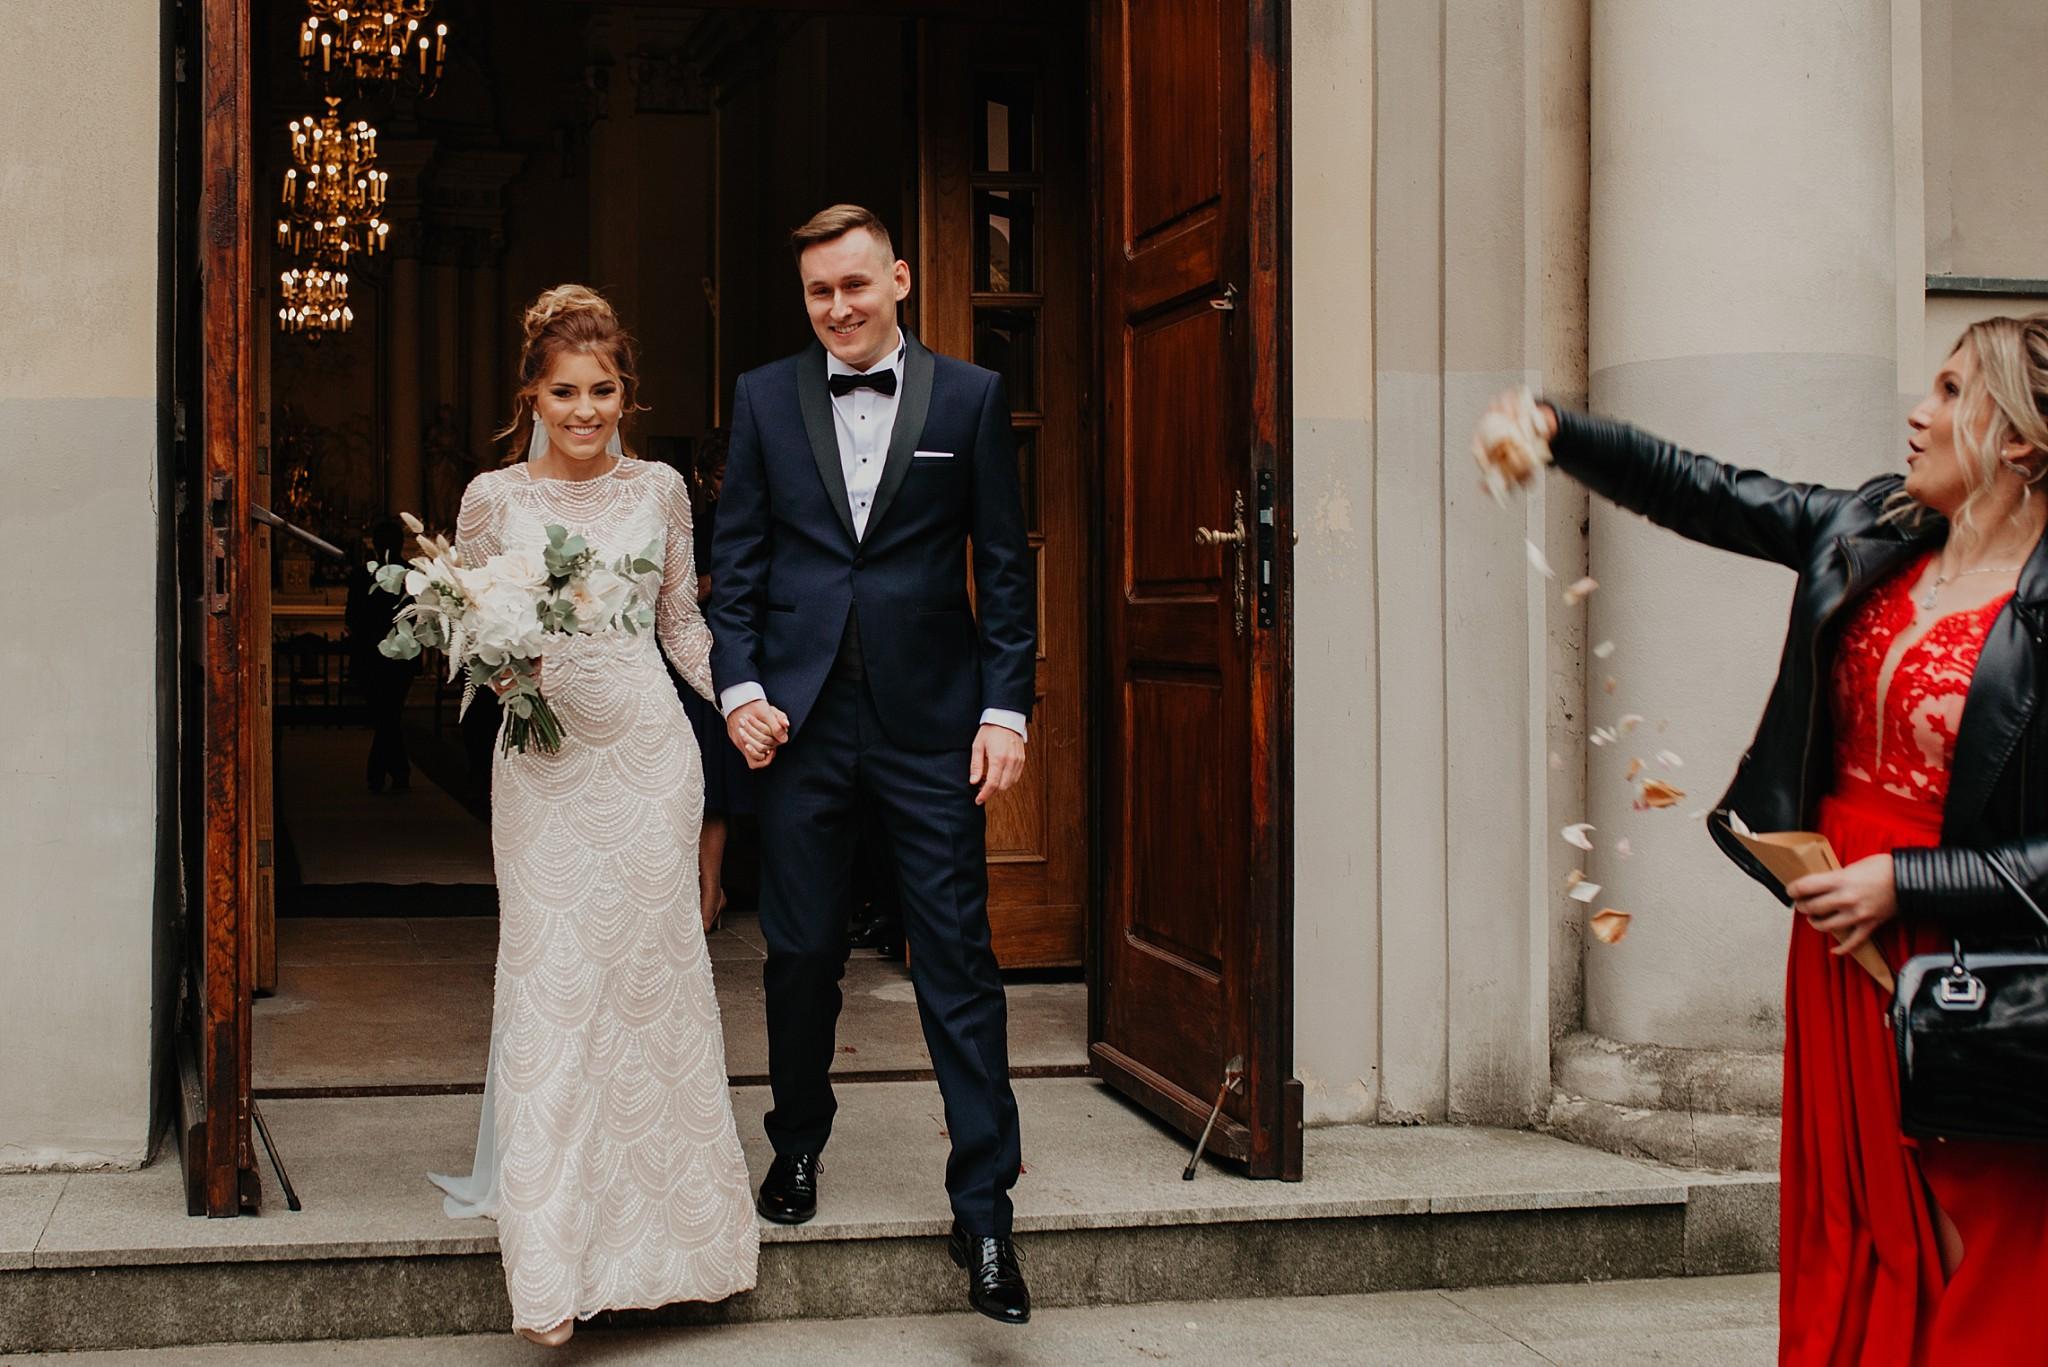 fotograf poznan wesele dobra truskawka piekne wesele pod poznaniem wesele w dobrej truskawce piekna para mloda slub marzen slub koronawirus slub listopad wesele koronawirus 215